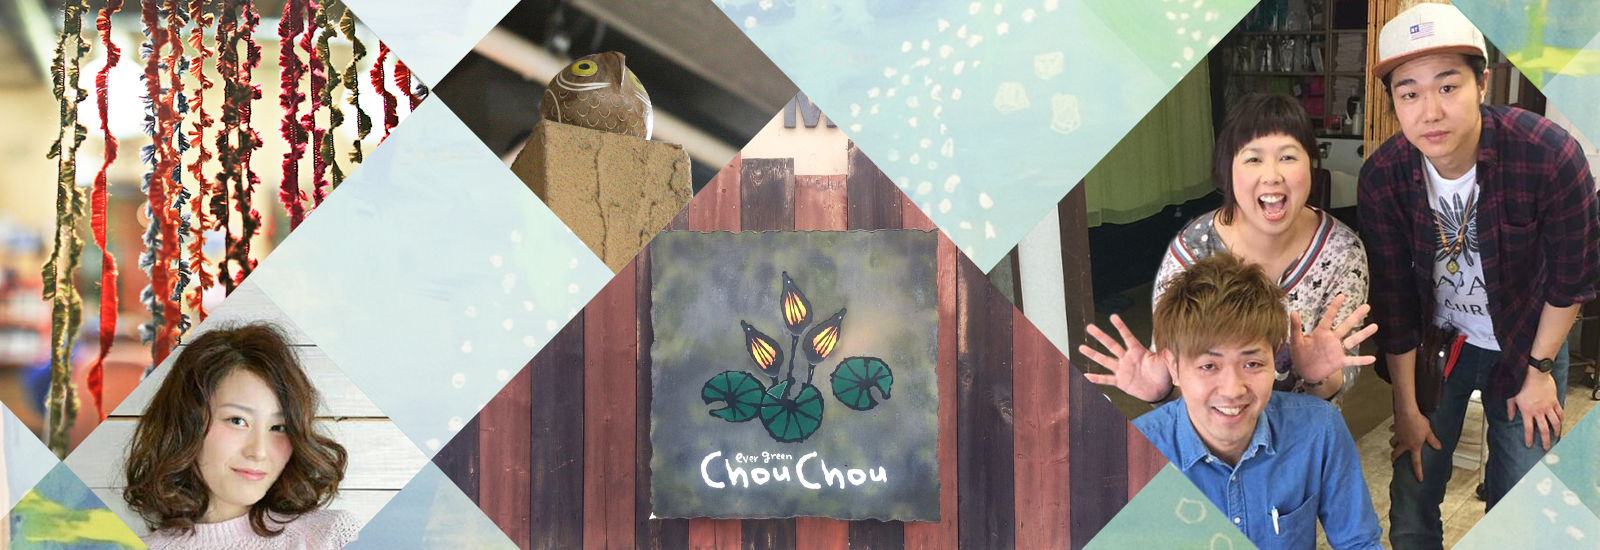 evergreen ChouChou